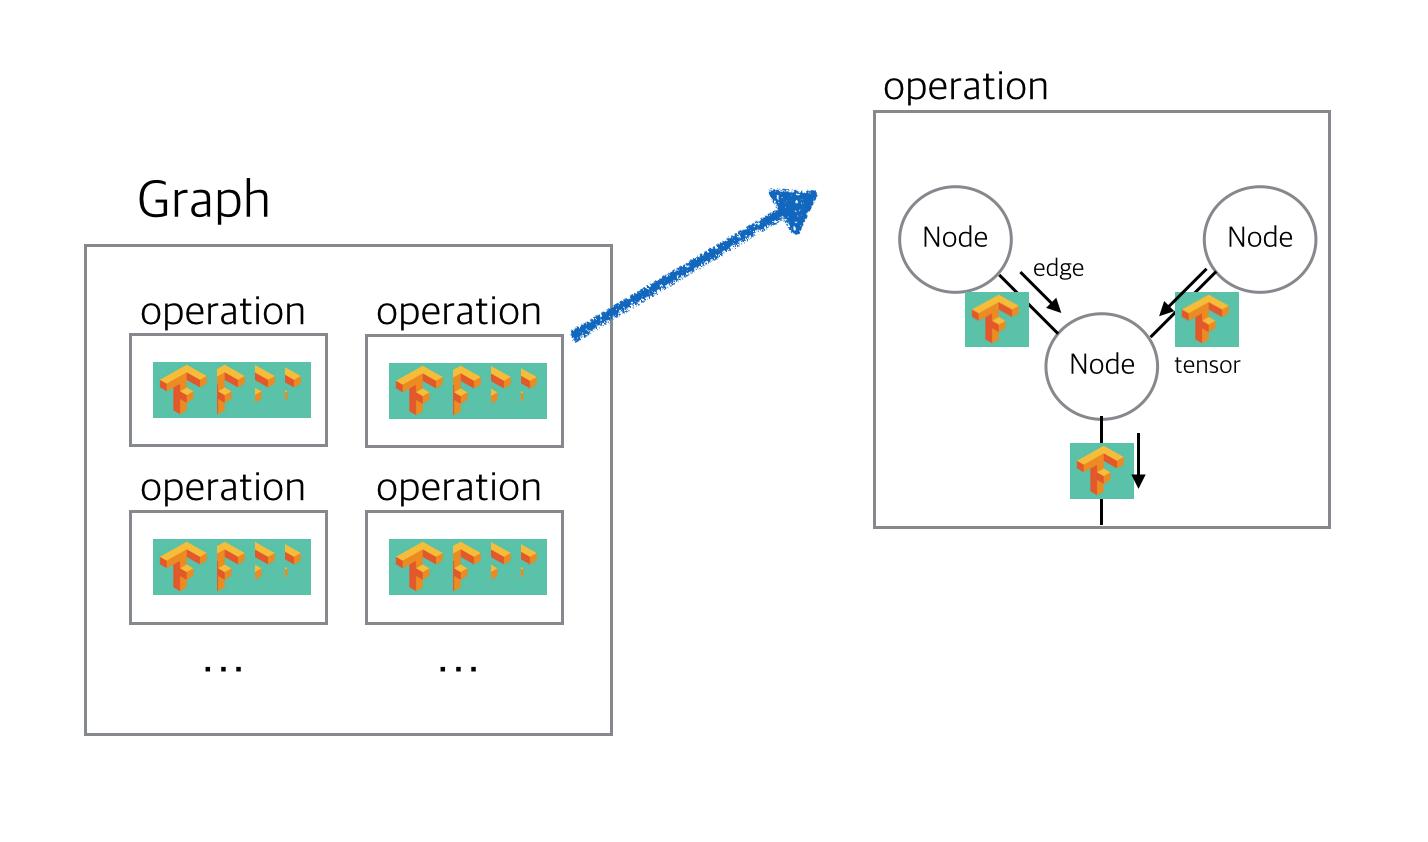 graph_operation